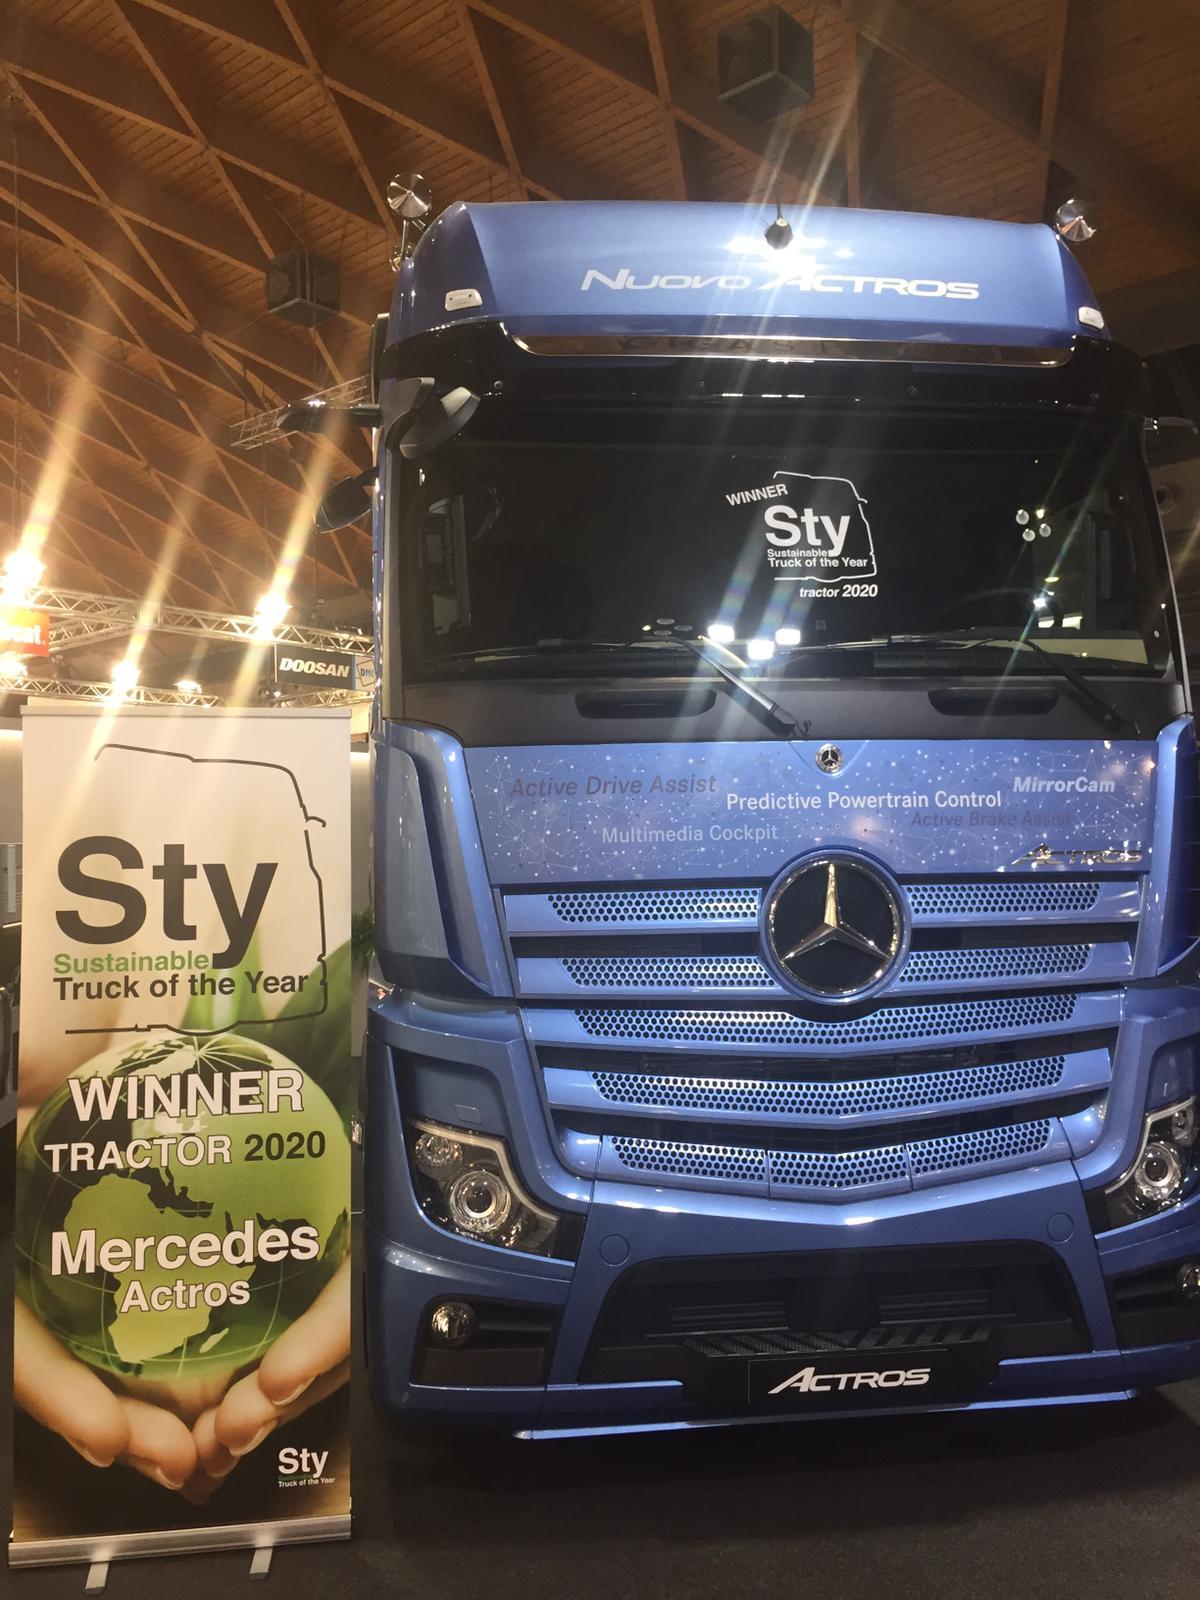 Nuovo Mercedes Actros conquista un importante premio al Sustainable Truck of the Year 2020